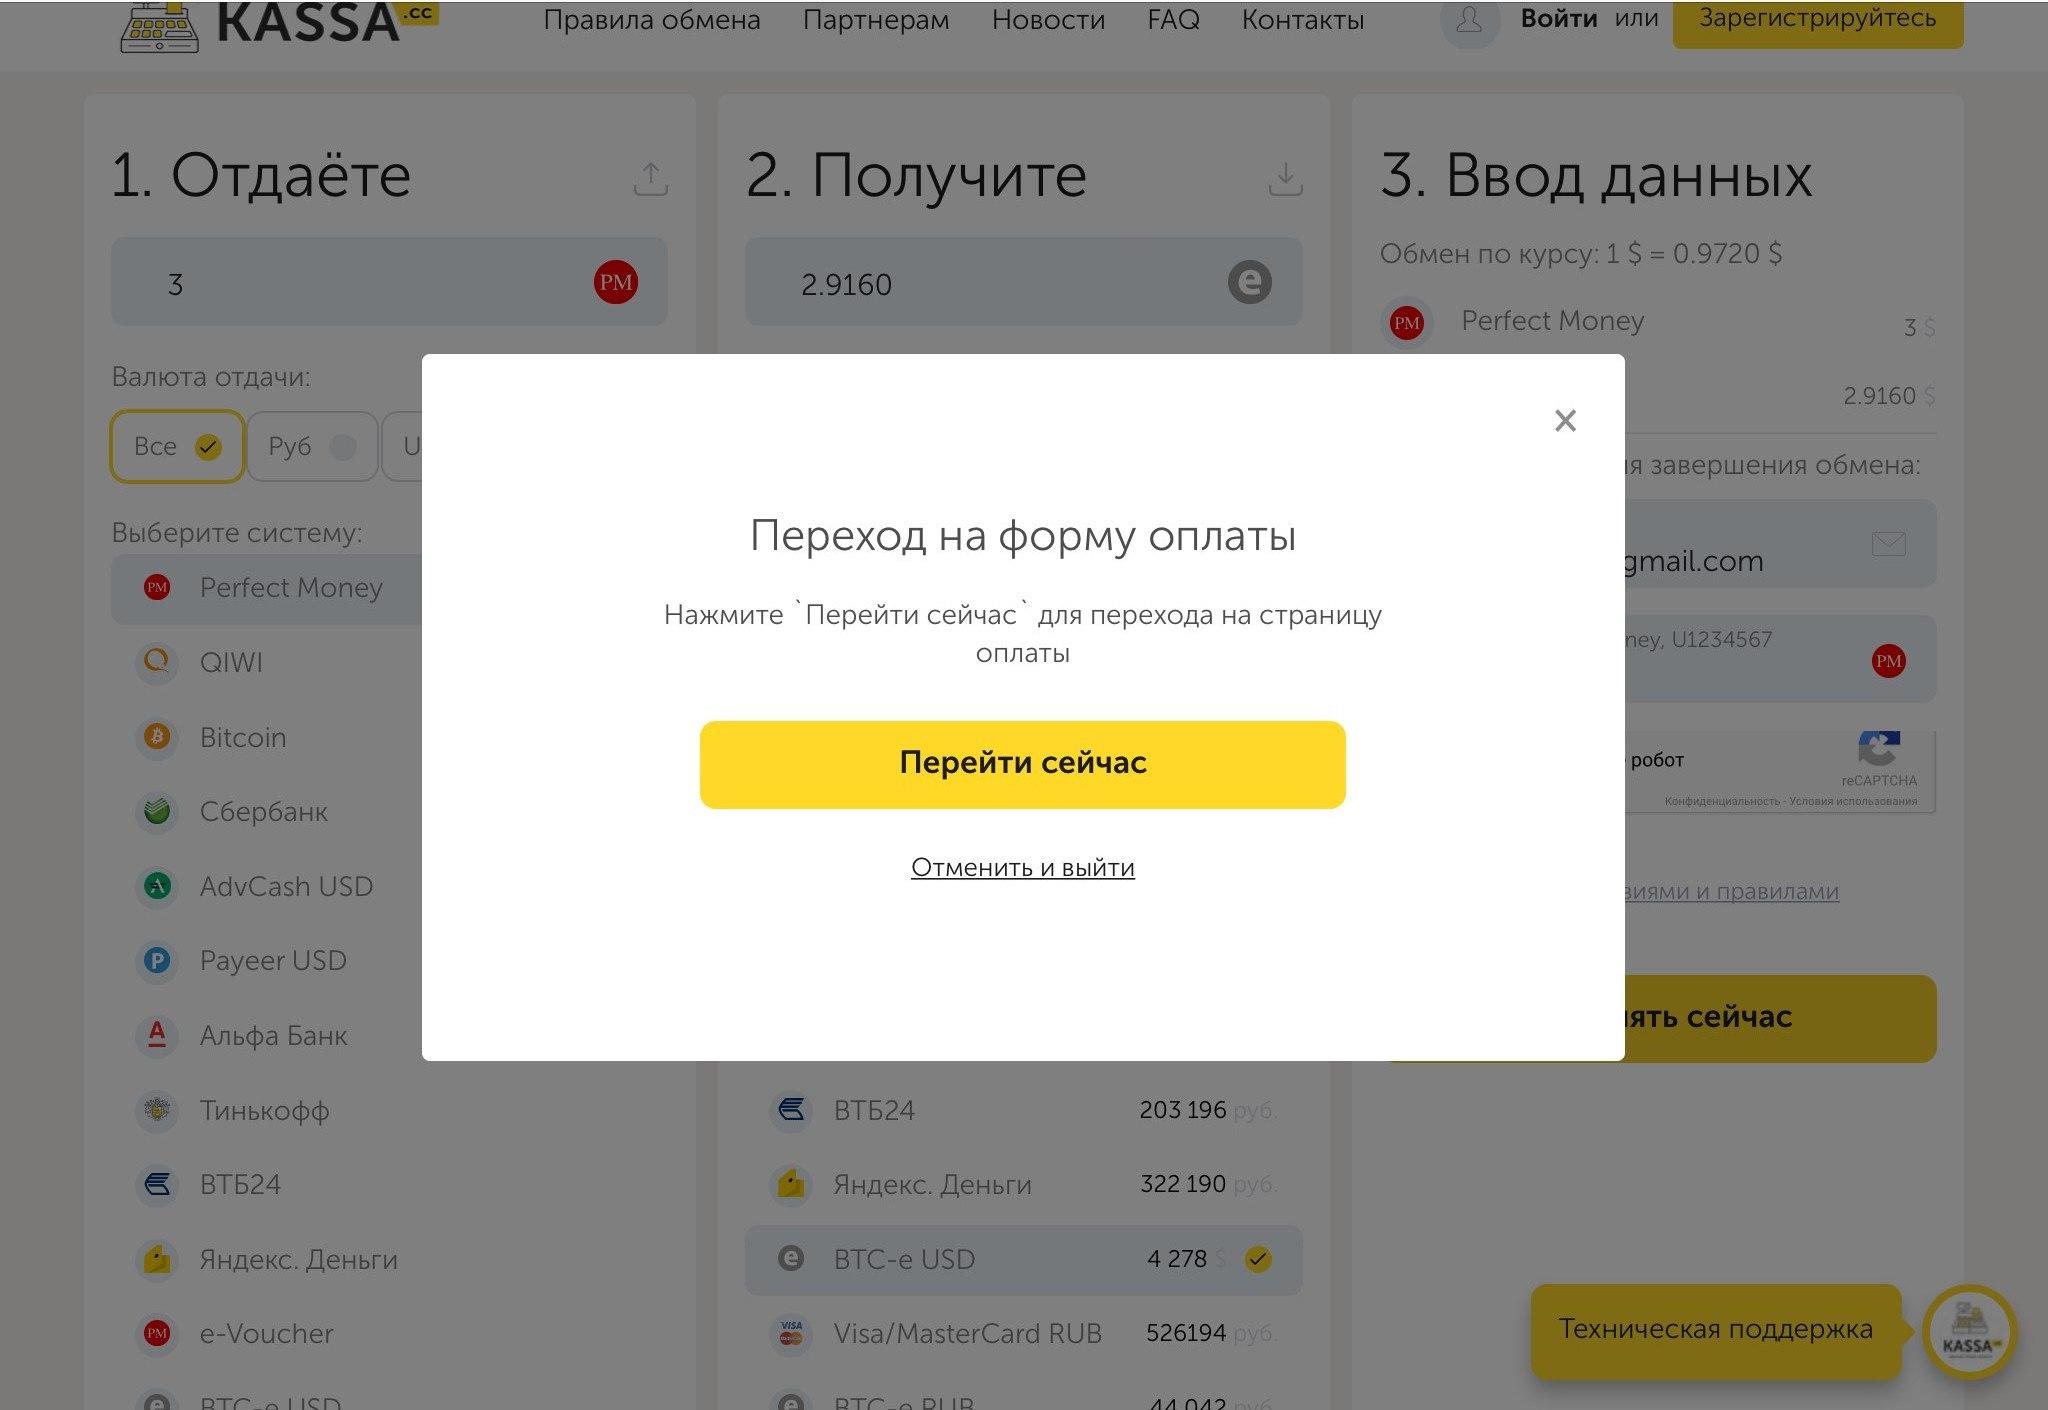 Kassa.cc - единый обмен валюты. Обмен Perfect Money USD на BTC-e USD